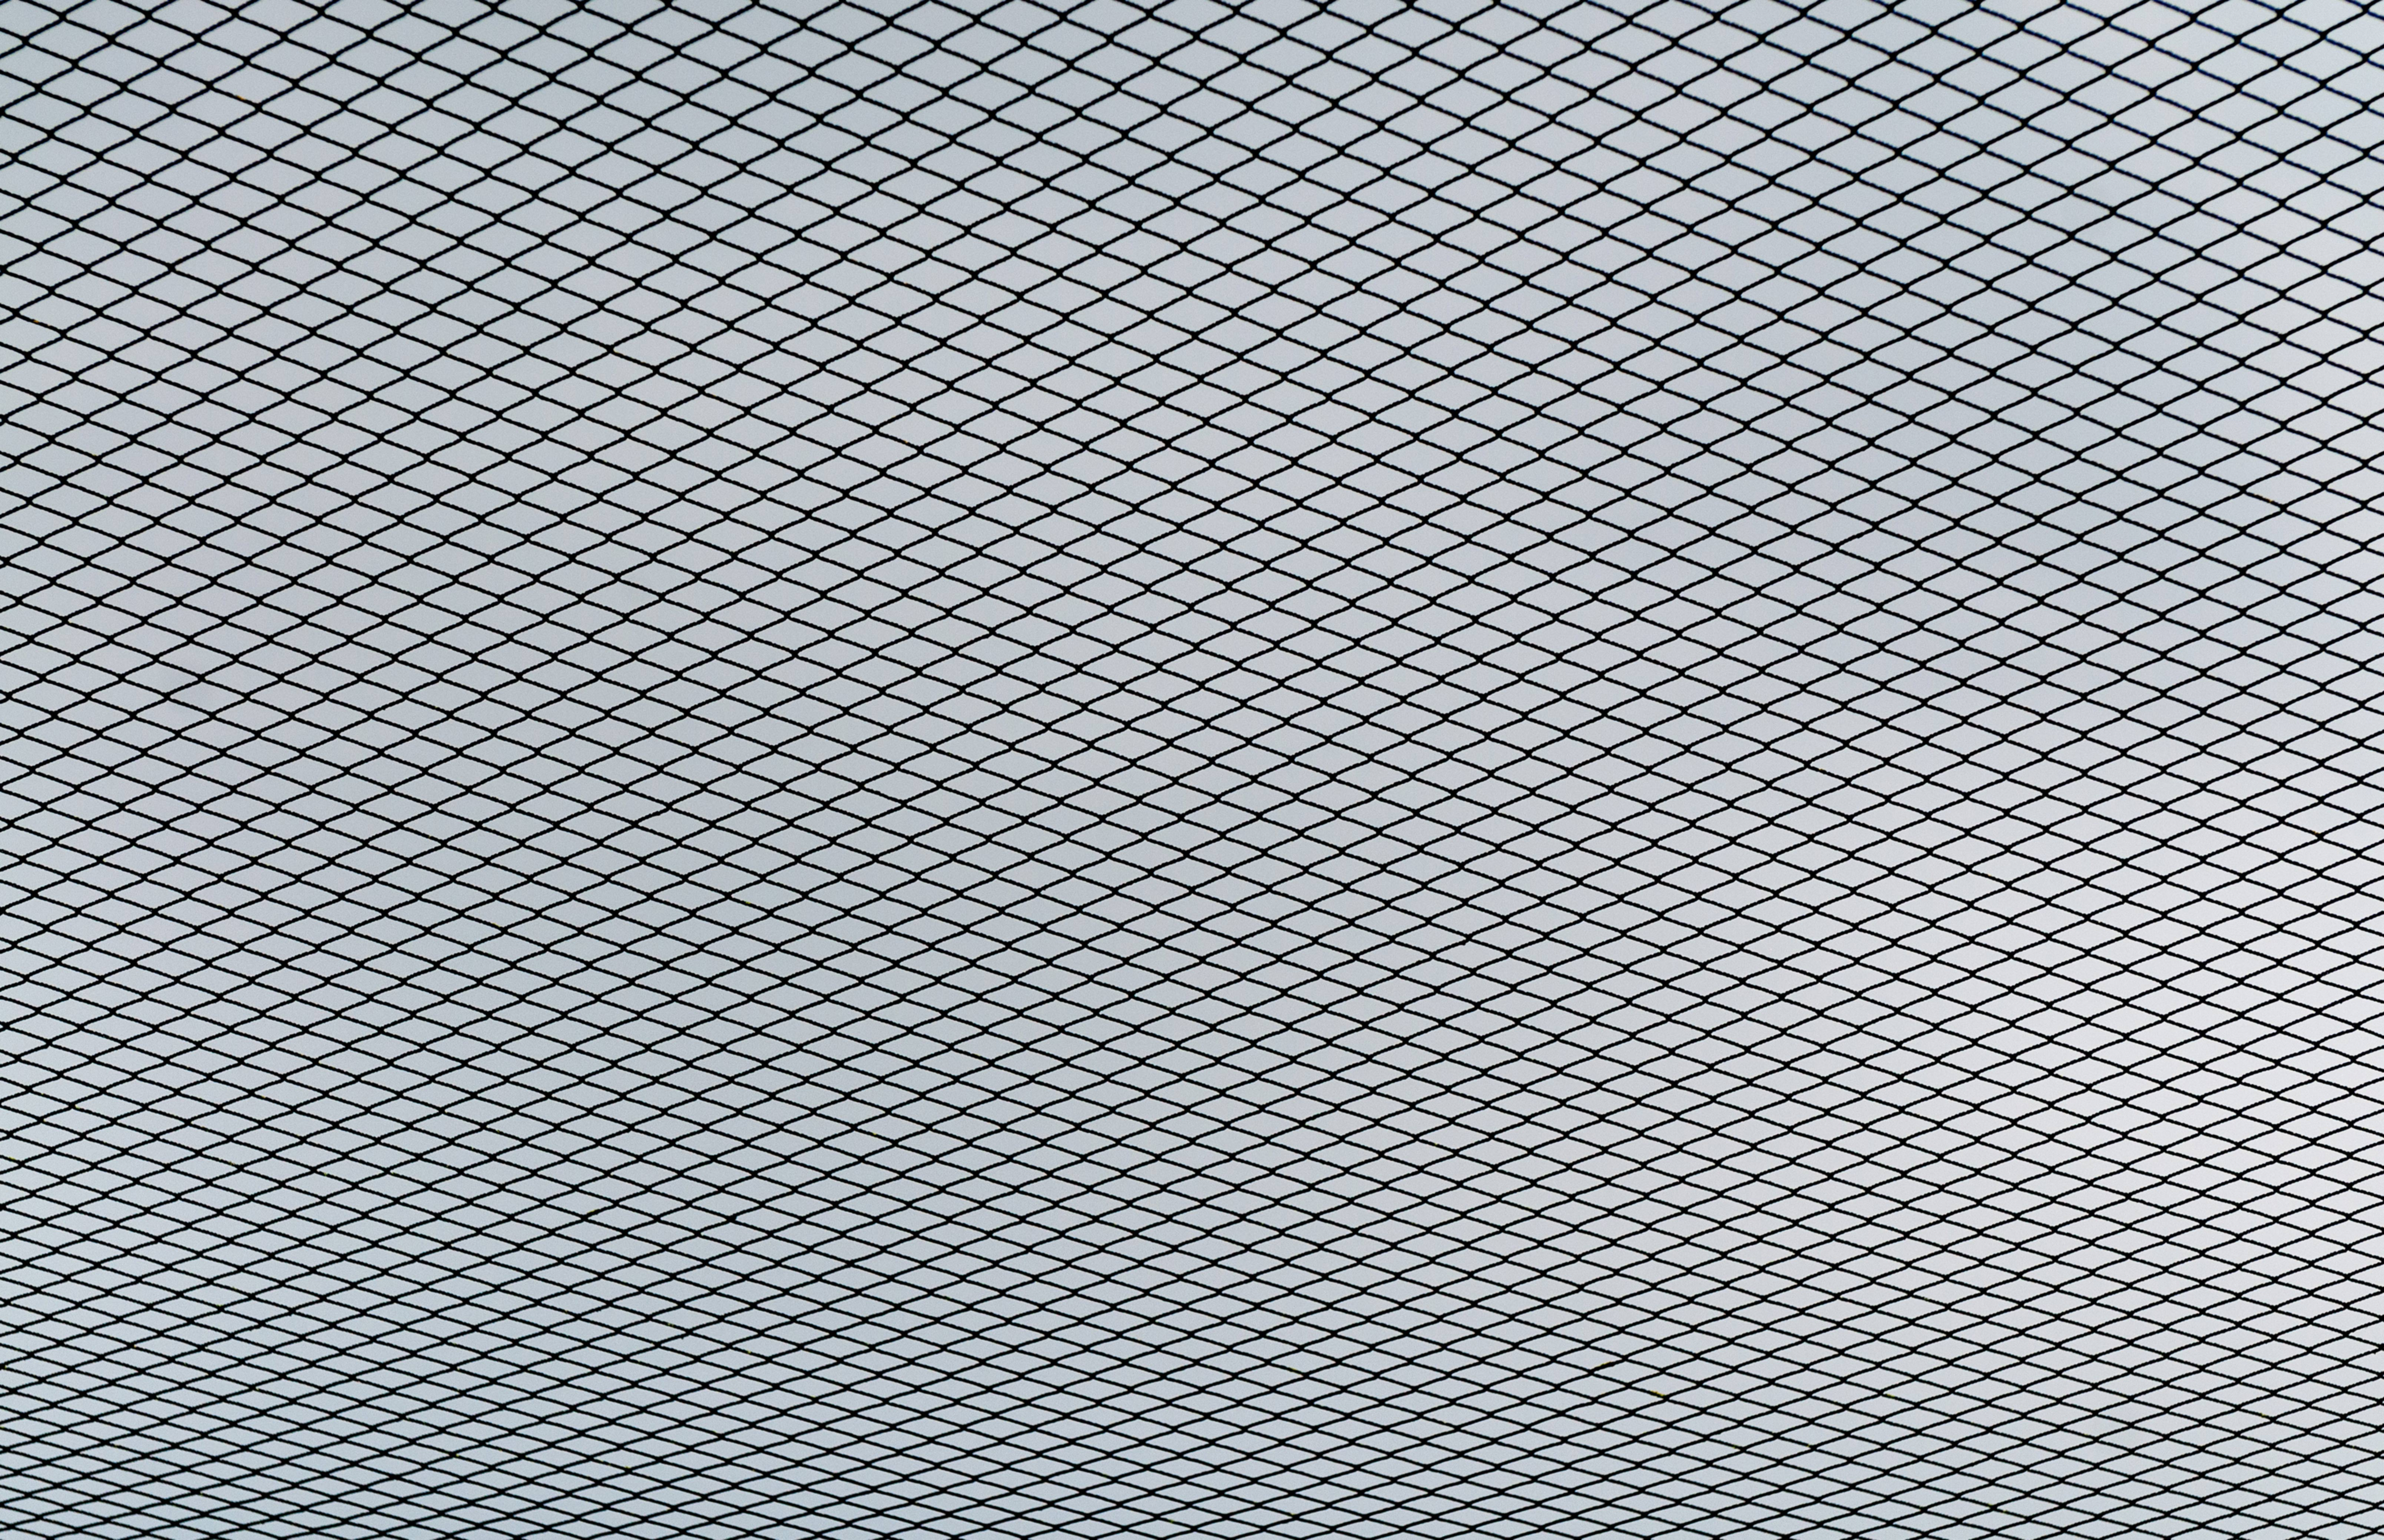 Subtle rope mesh pattern background photo